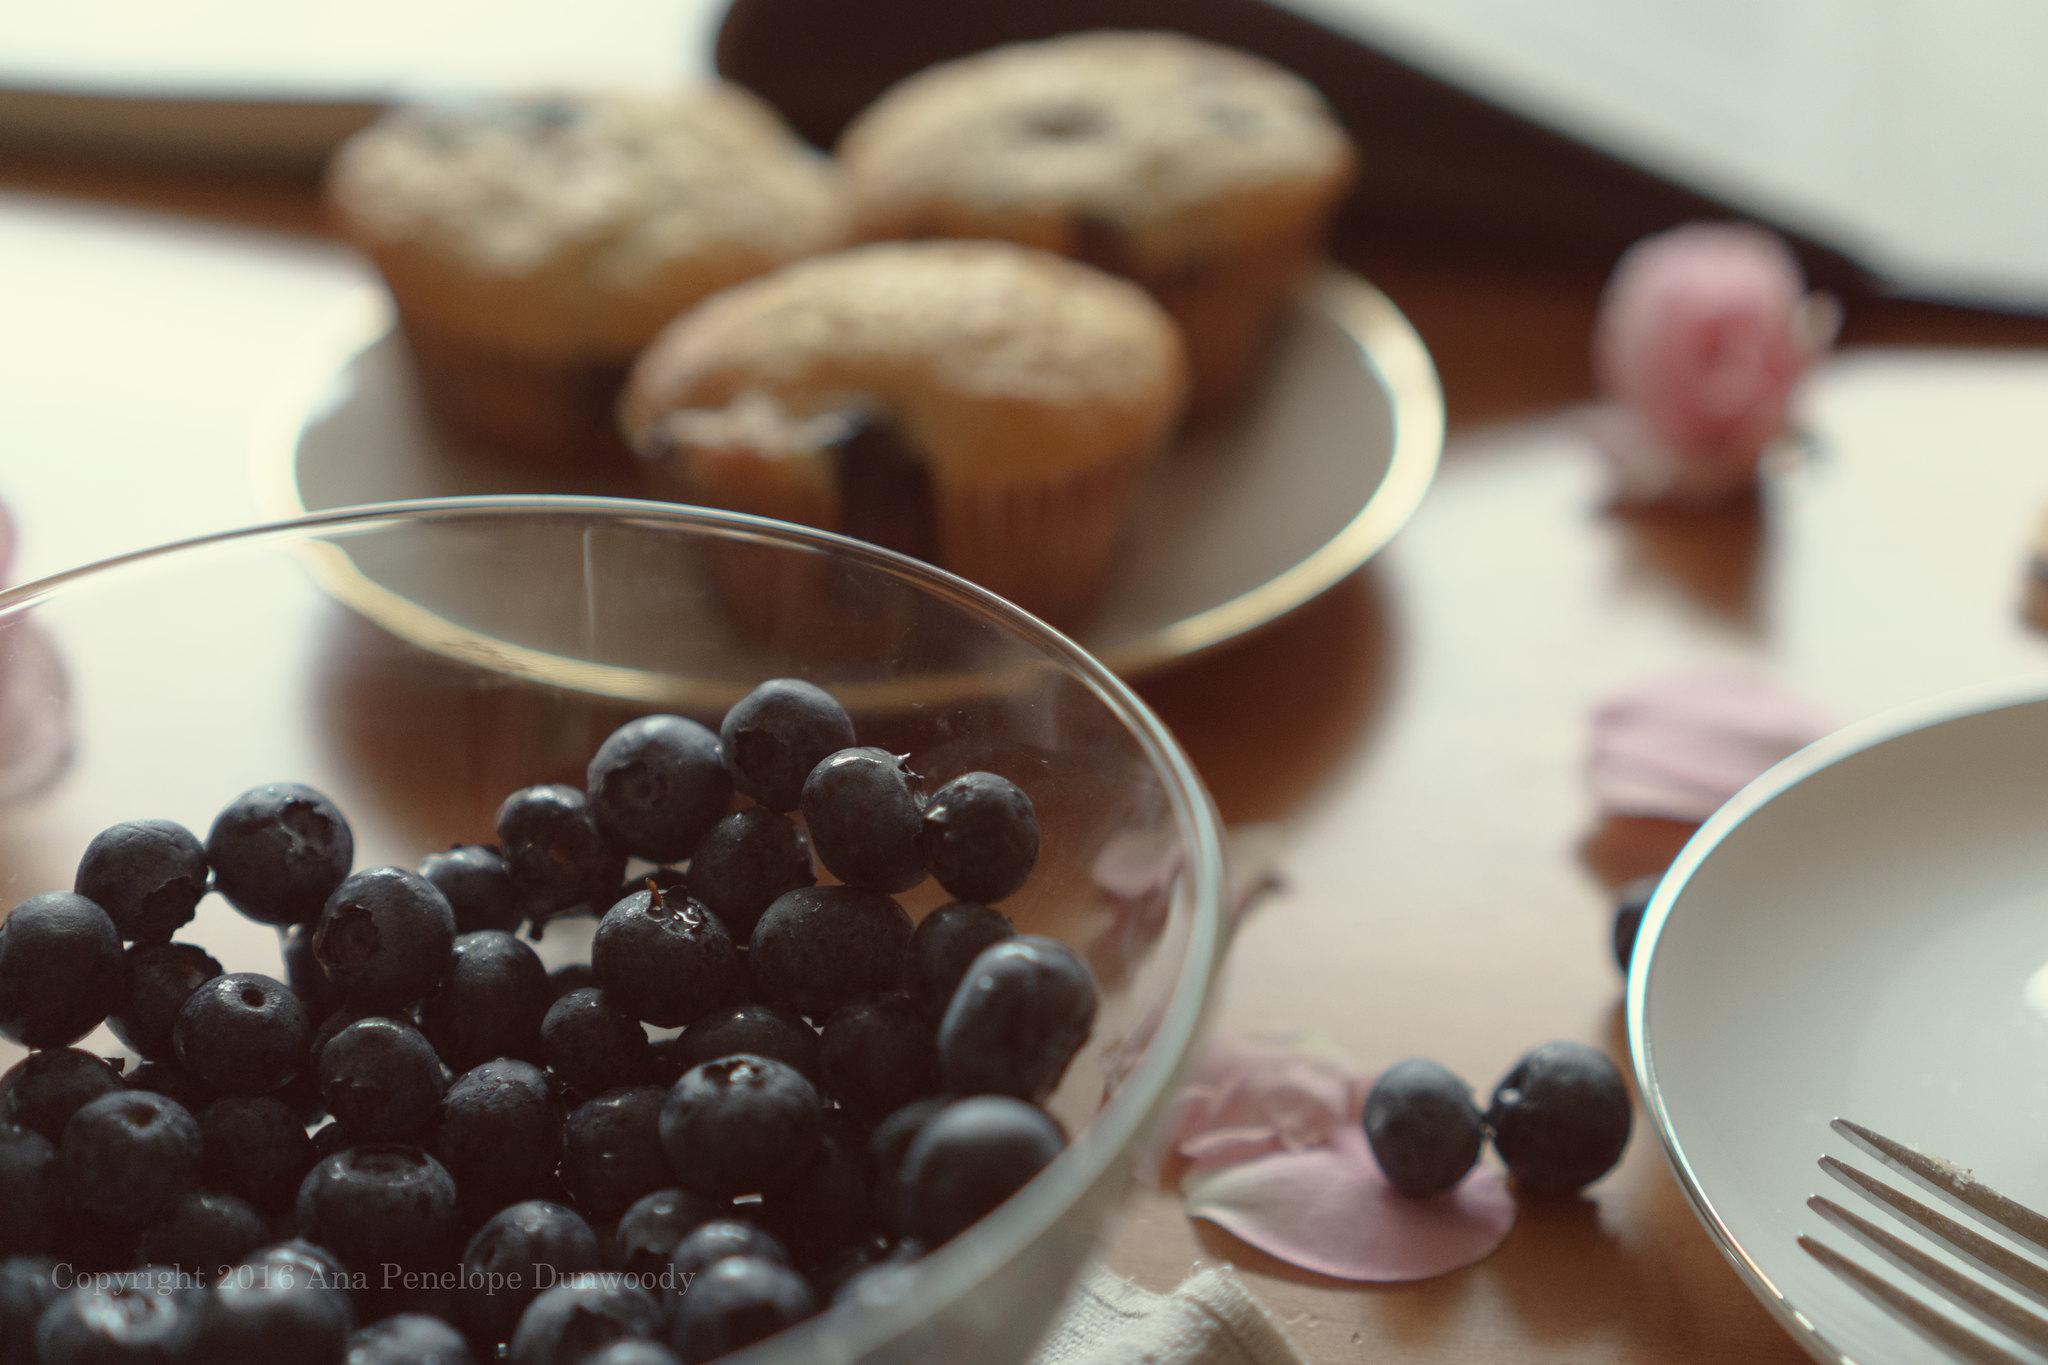 Blueberries, detail